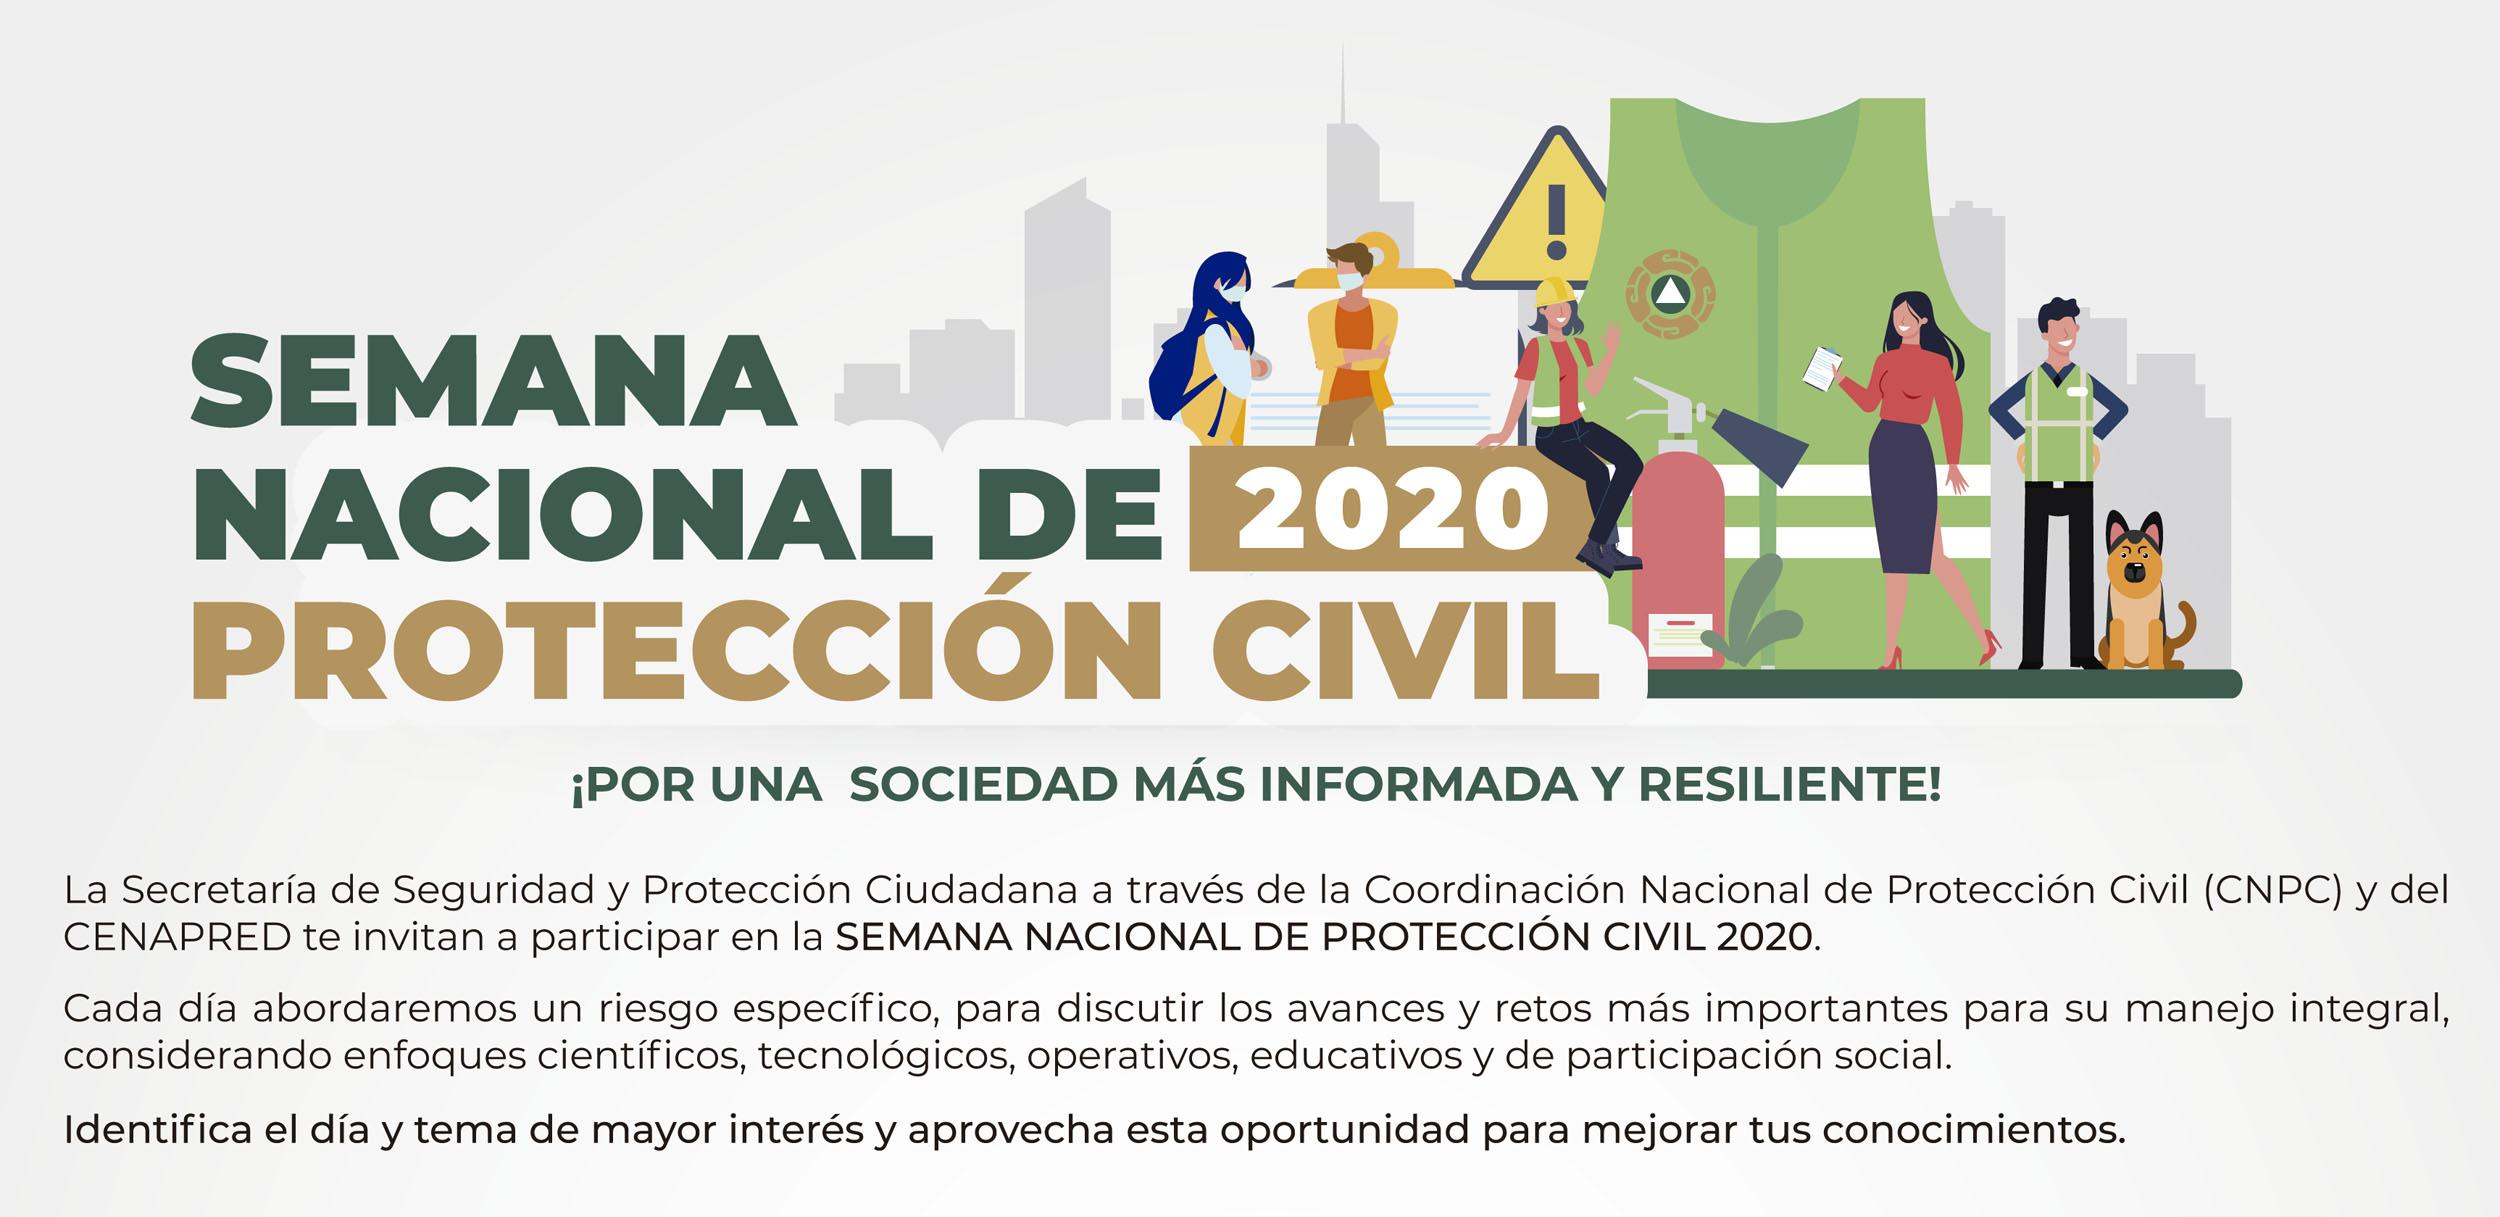 Semana Nacional de Protección Civil 2020